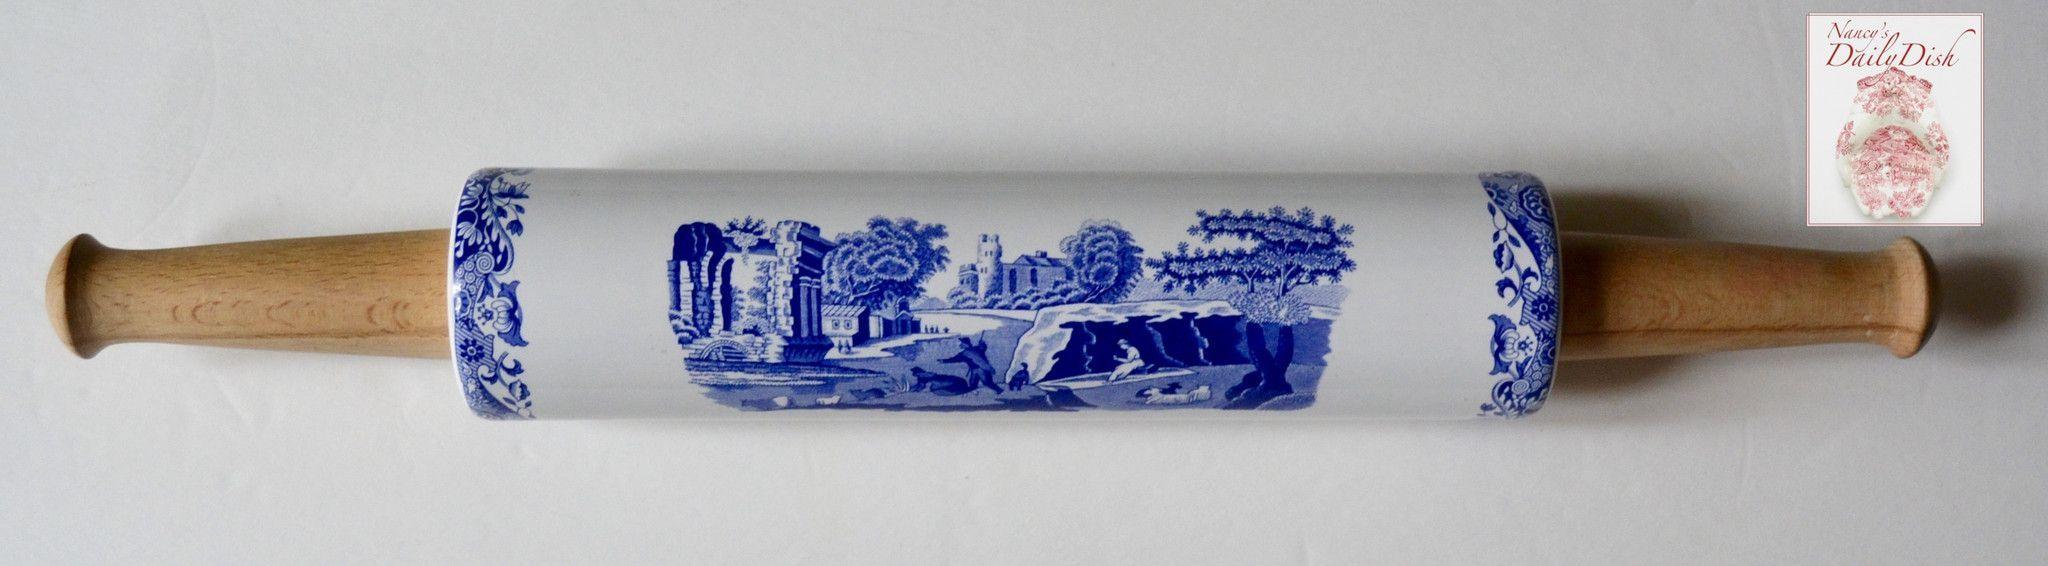 Blue english ironstone transferware rolling pin wood